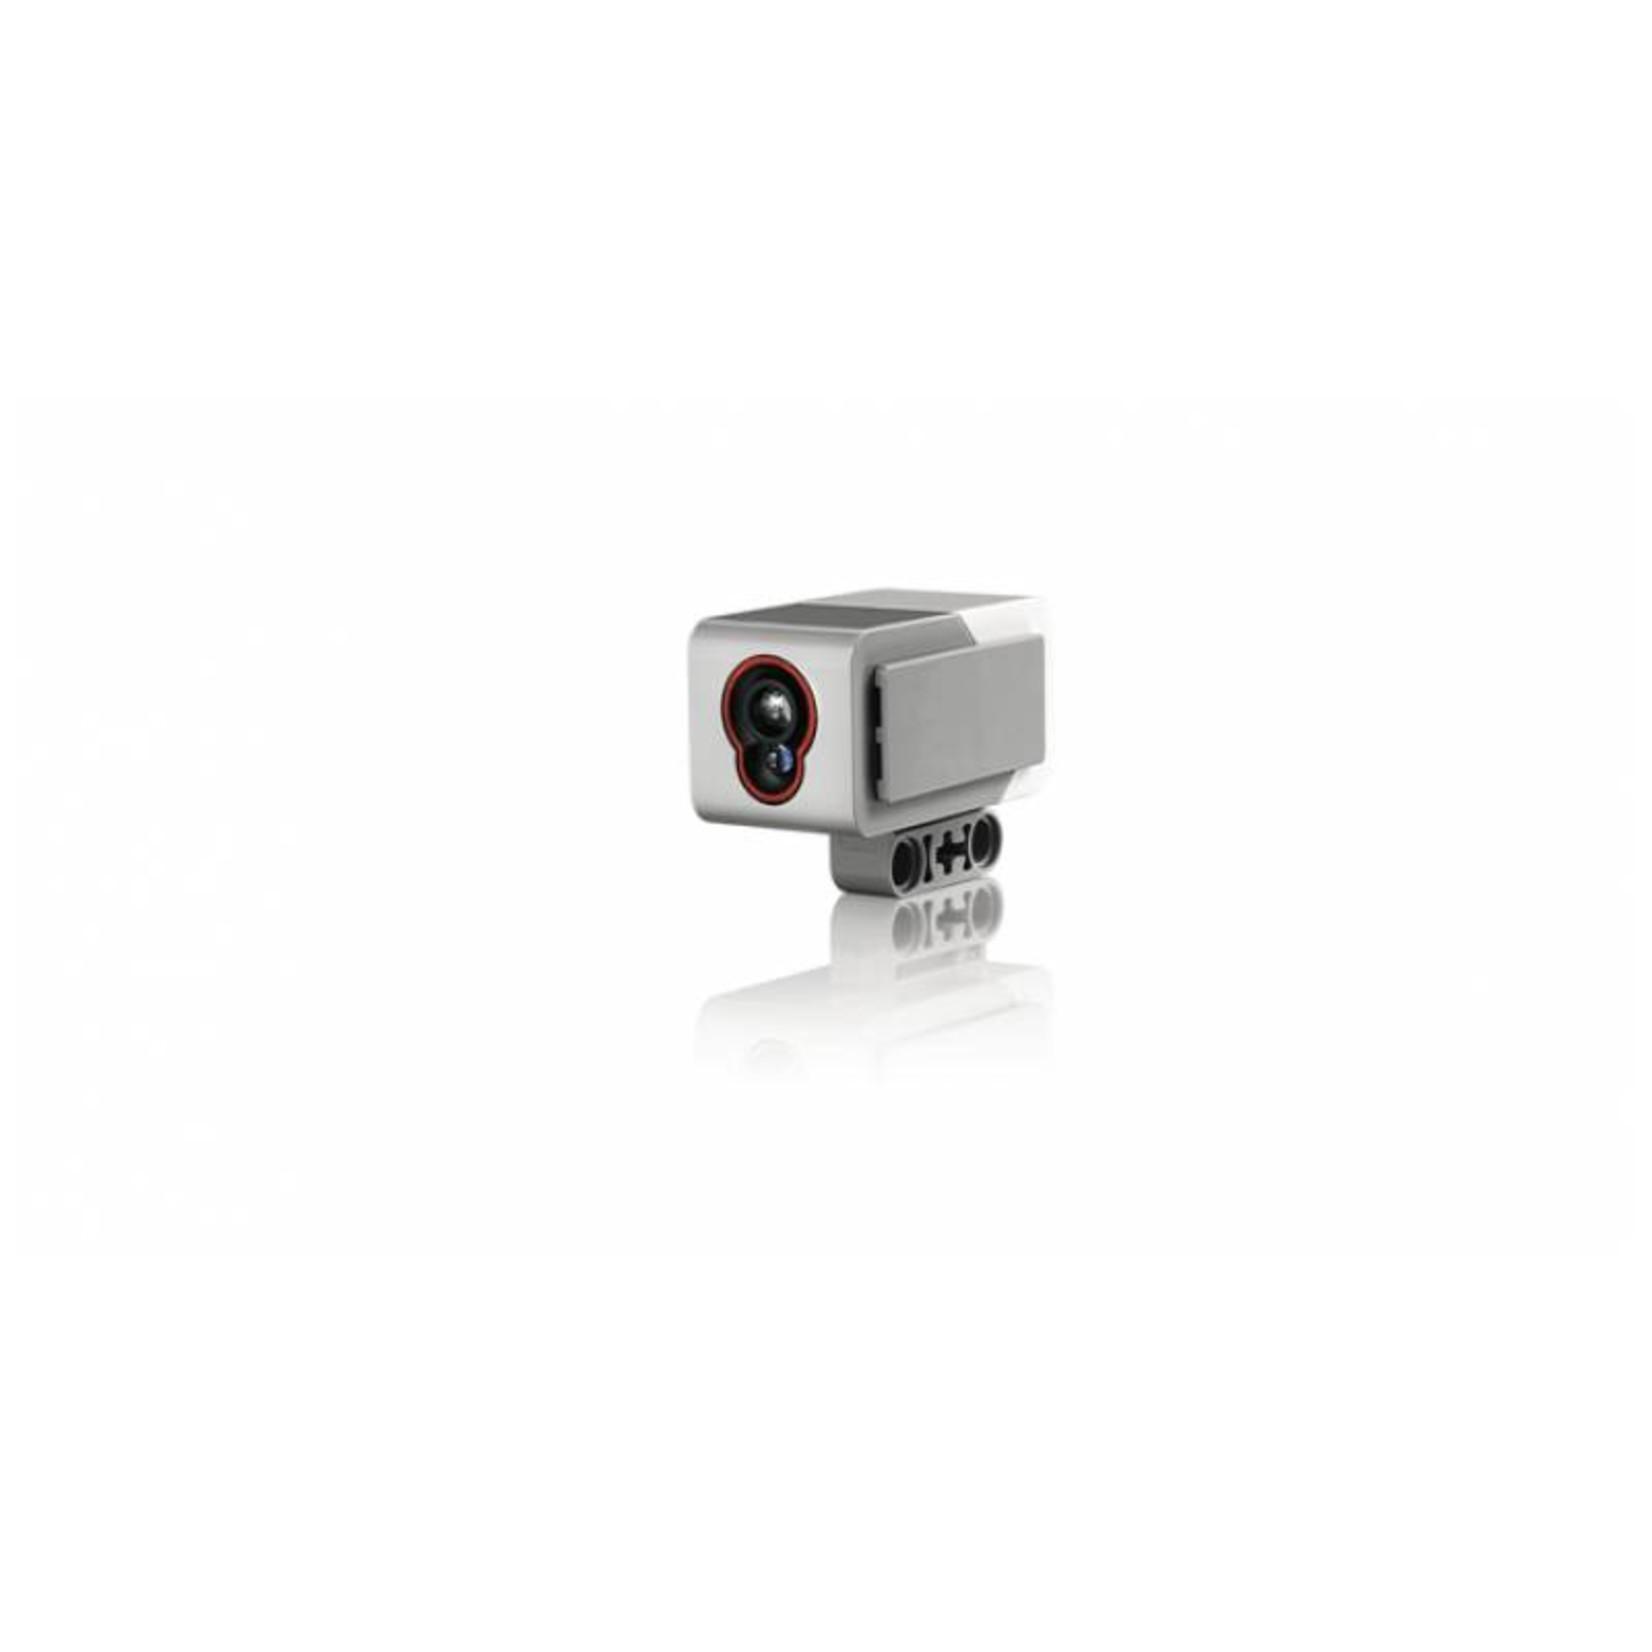 LEGO® Education EV3 Color/Light Sensor